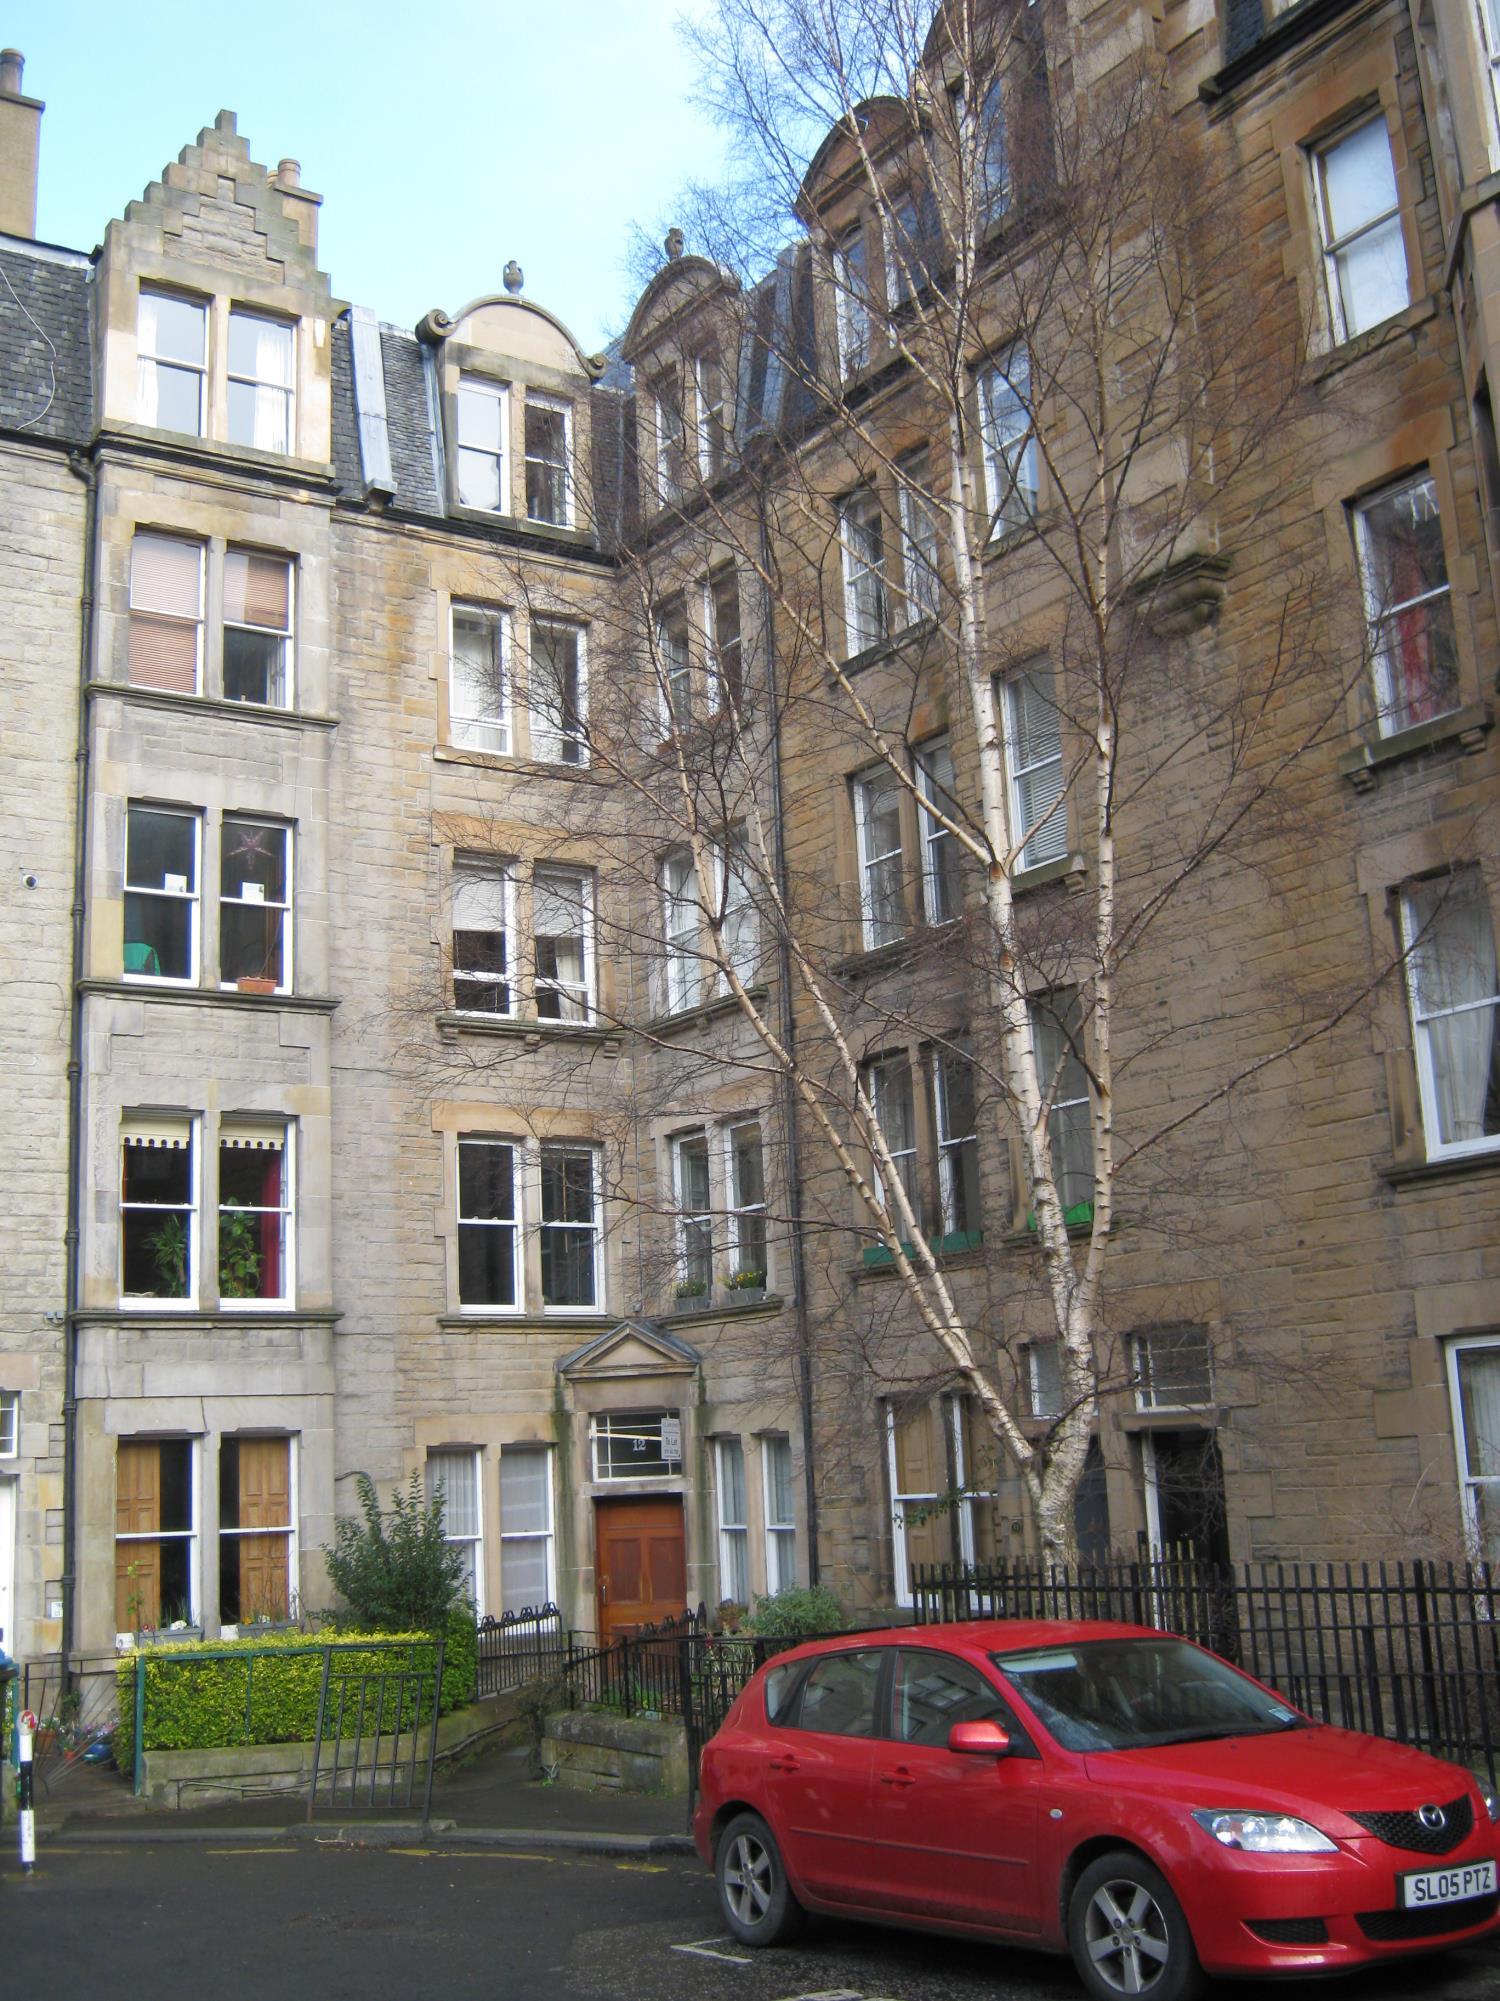 View property for rent Viewforth Square, Edinburgh